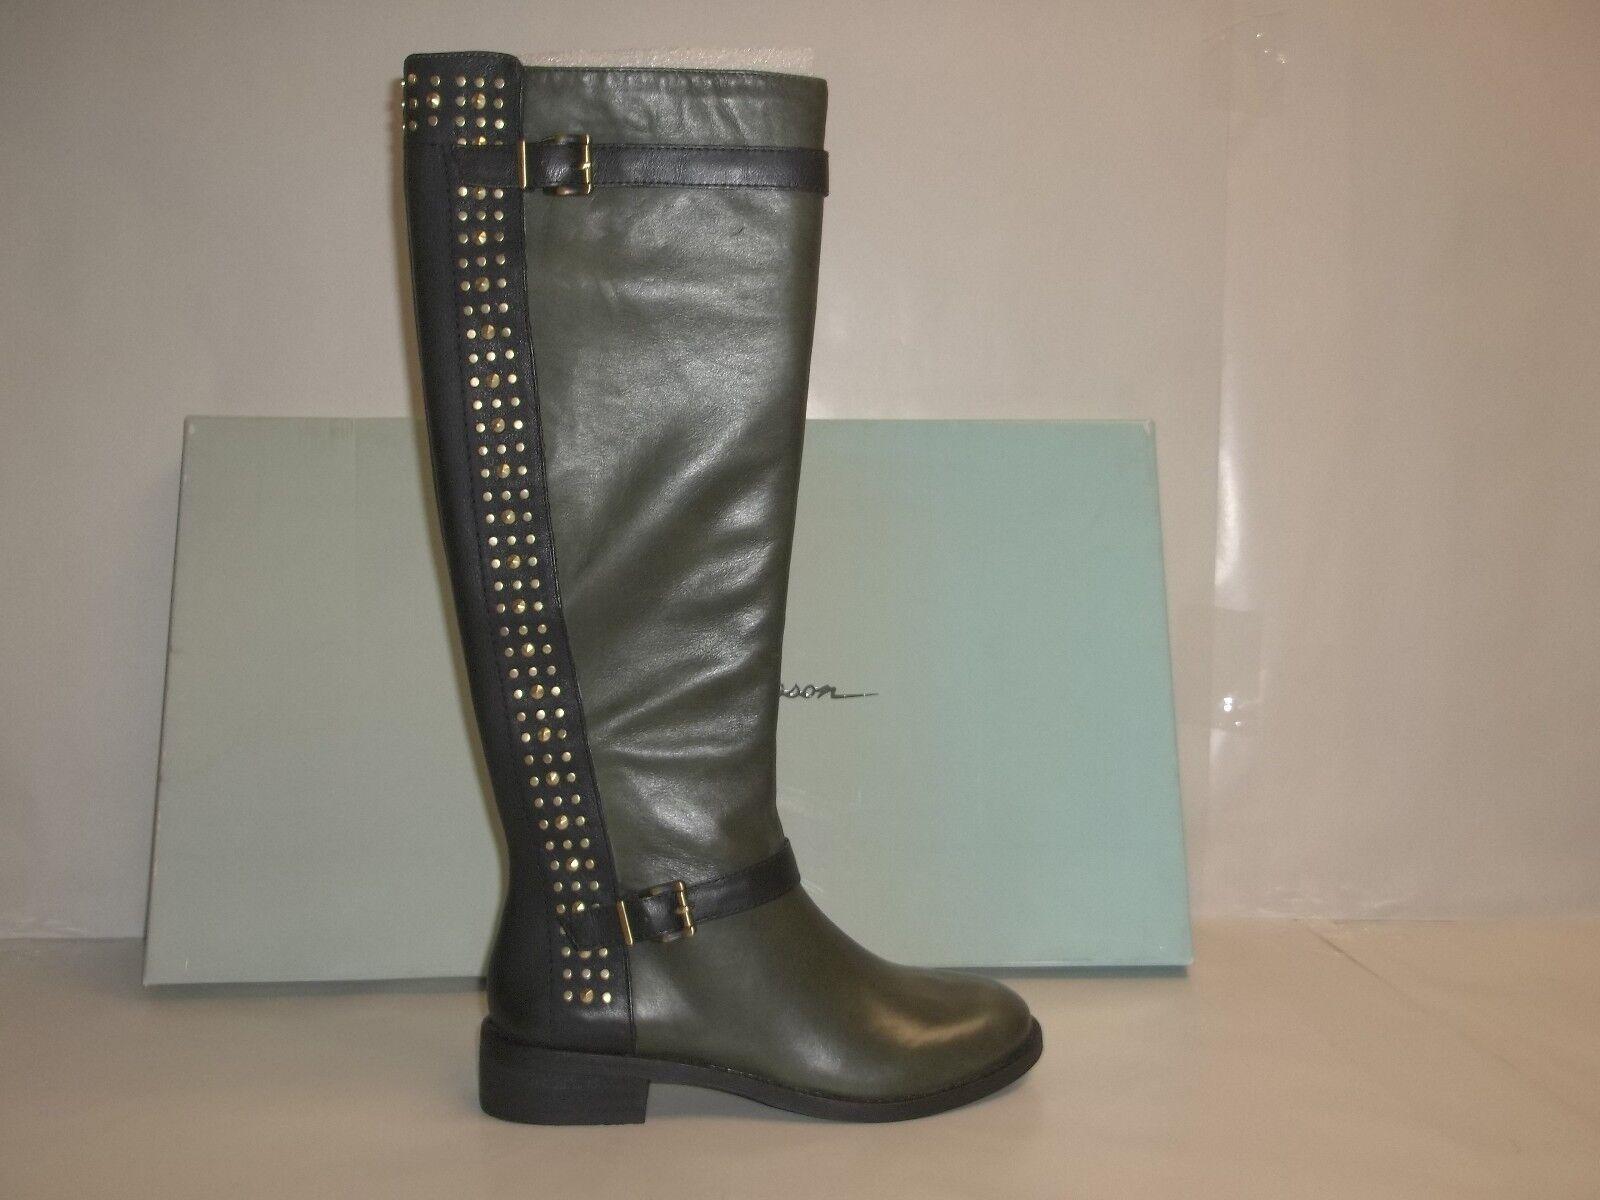 Jessica Simpson Größe 5.5 M ELLISTER Fatigue Leder Stiefel NEU Damenschuhe Schuhes